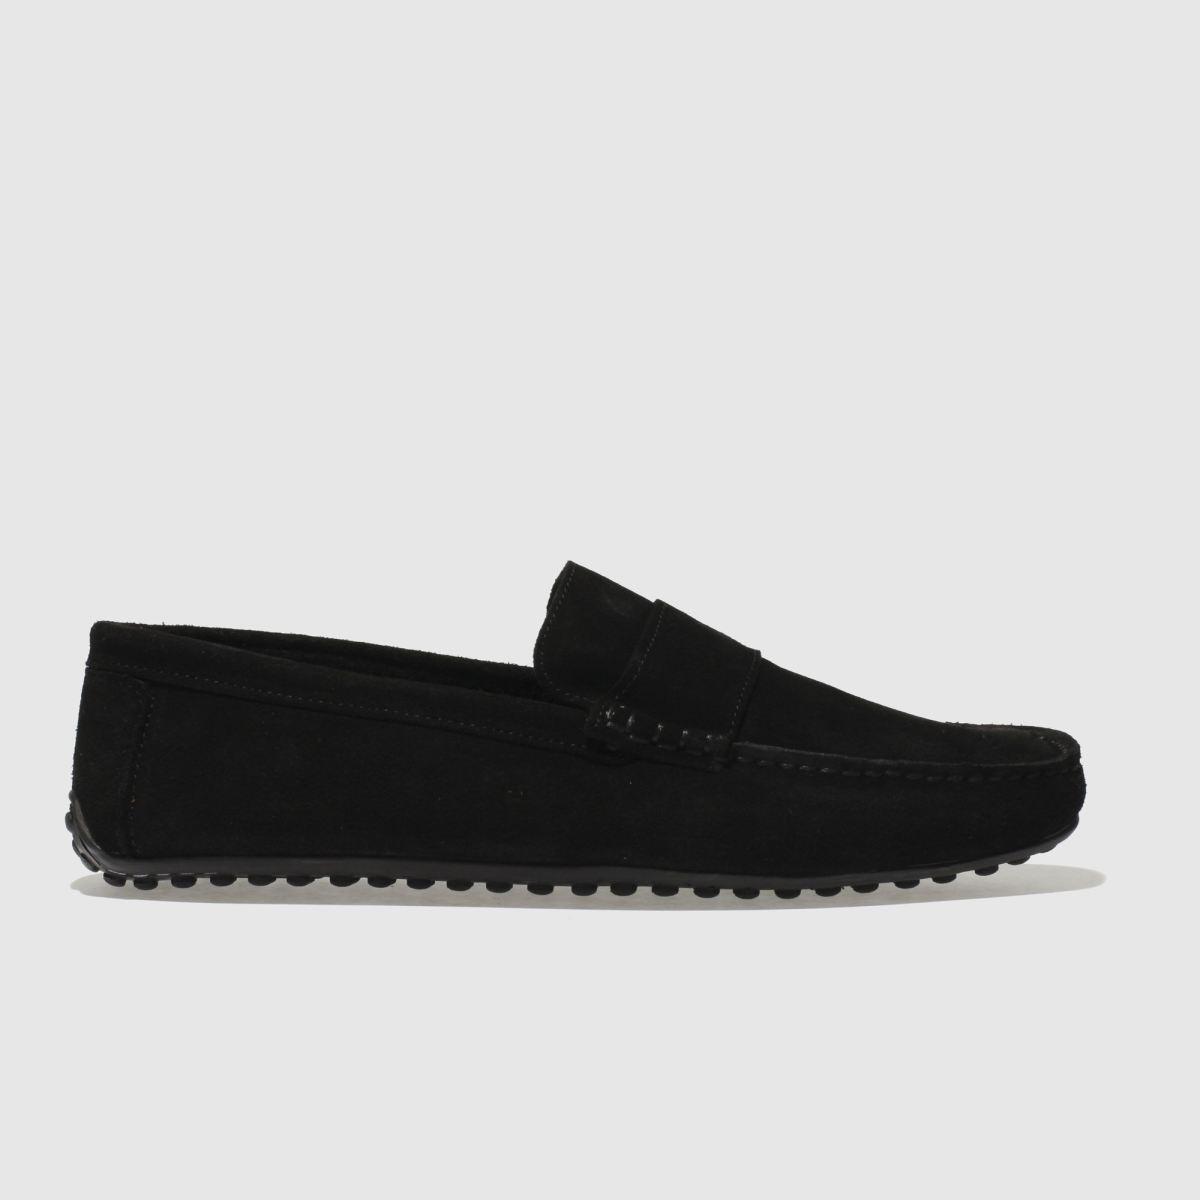 Schuh Black Mario Driver Shoes